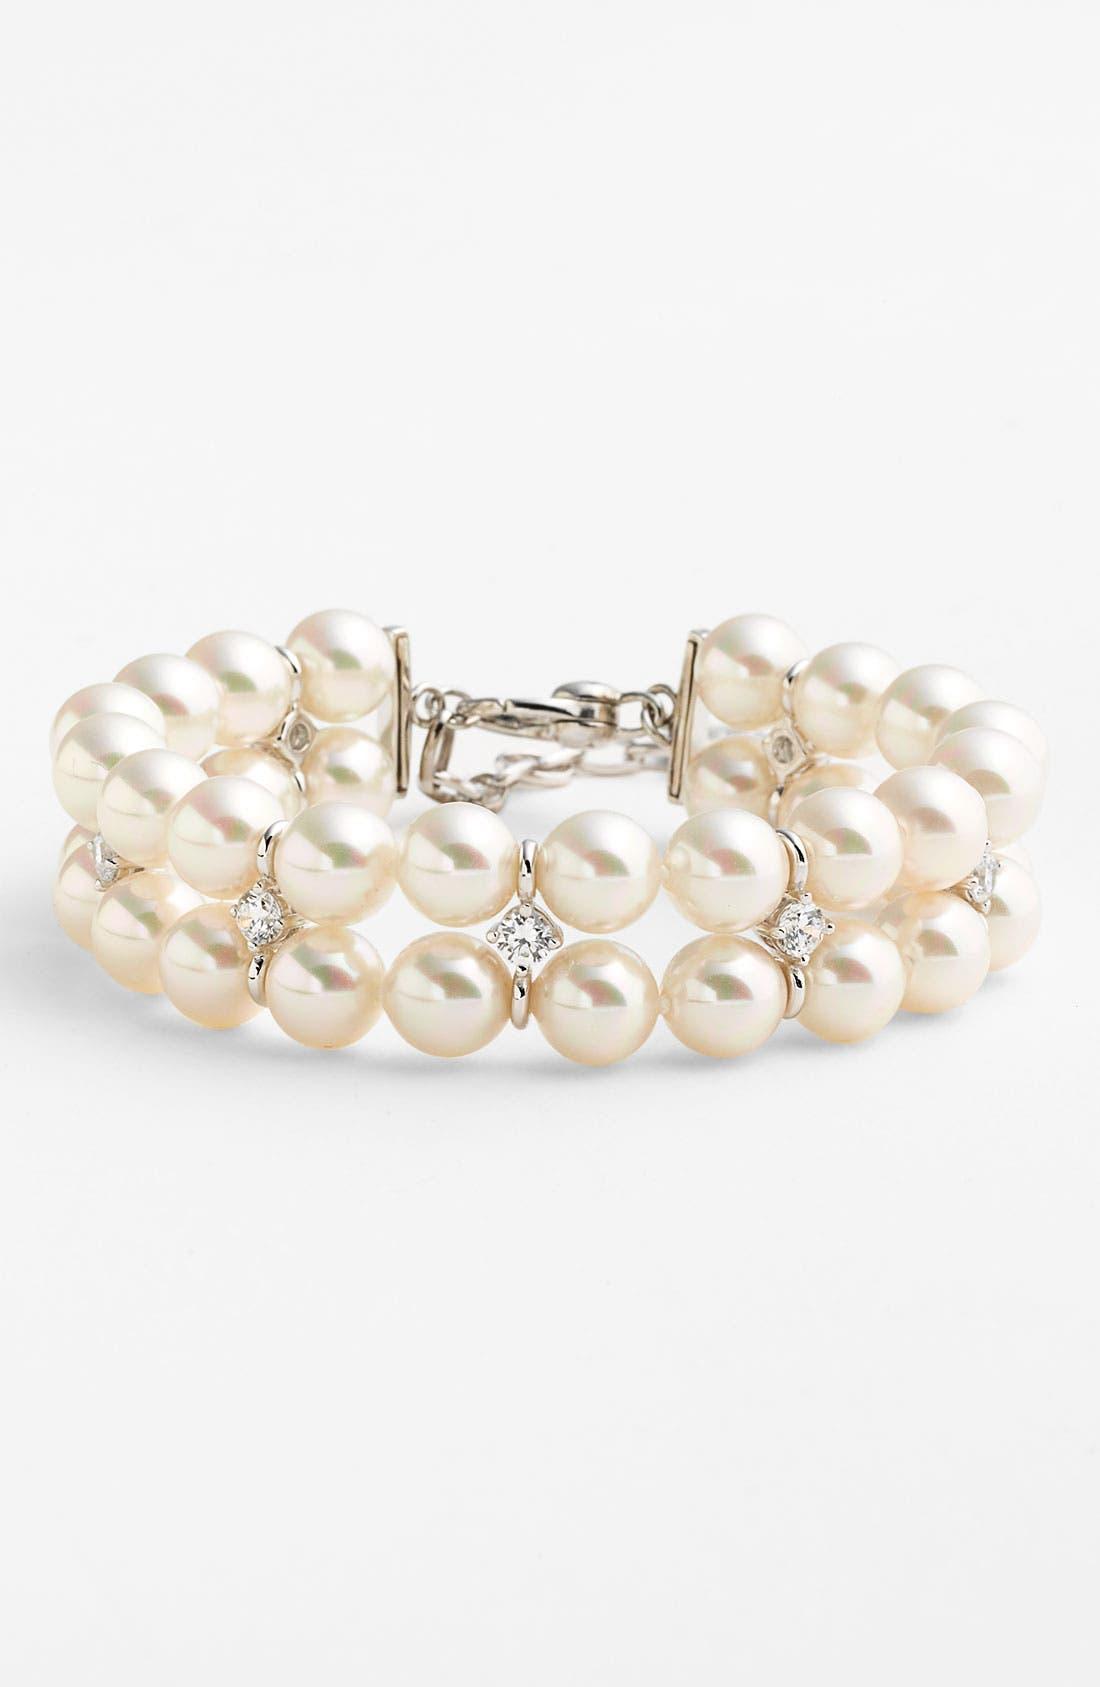 Main Image - Majorica Double Row Pearl & Cubic Zirconia Bracelet